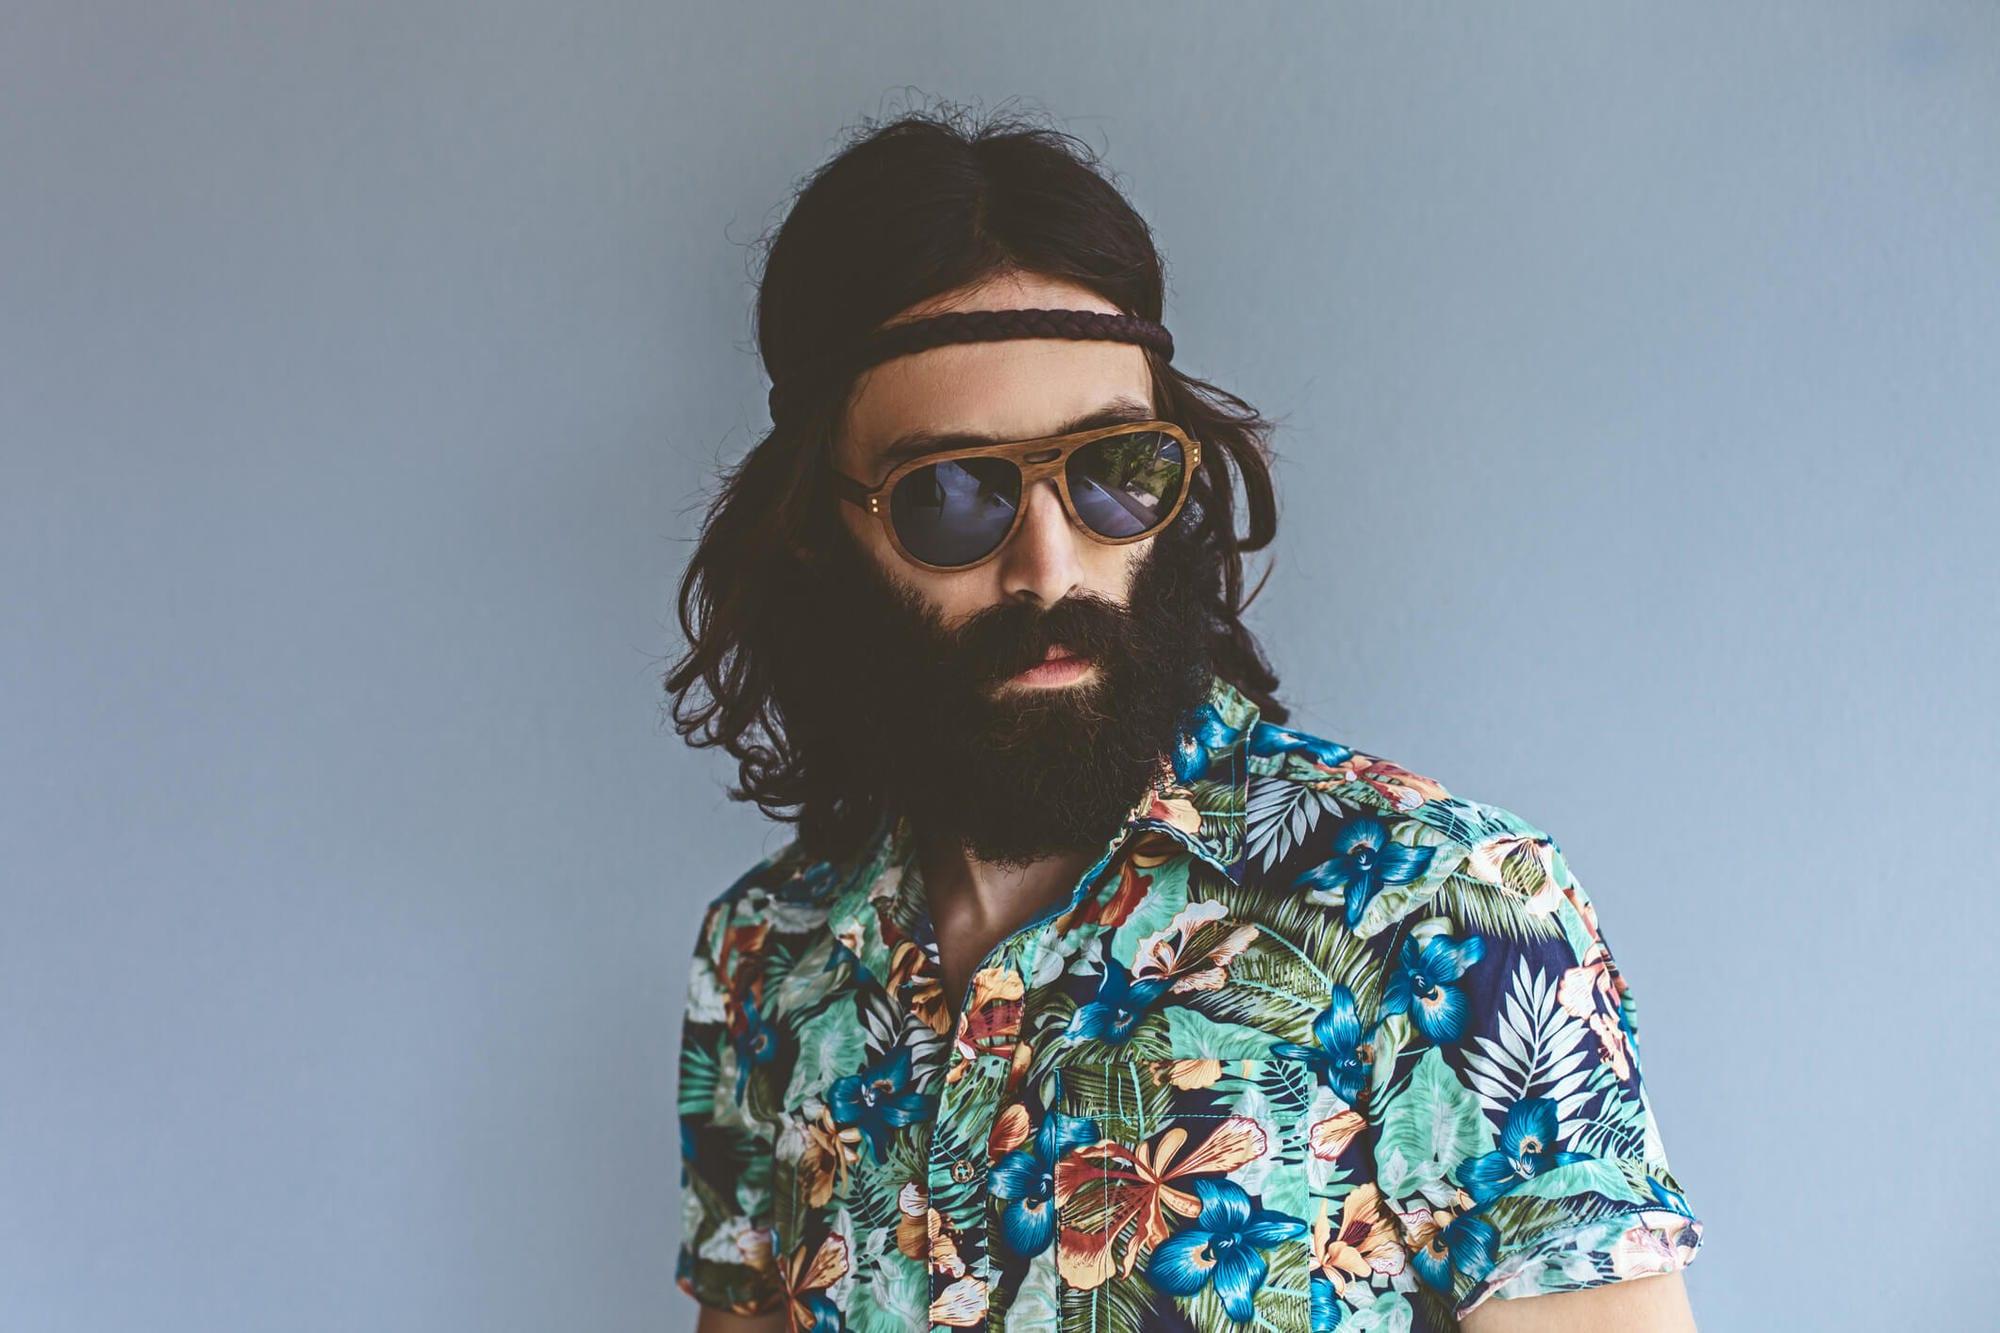 estilos de cabello largo para hombres hippie